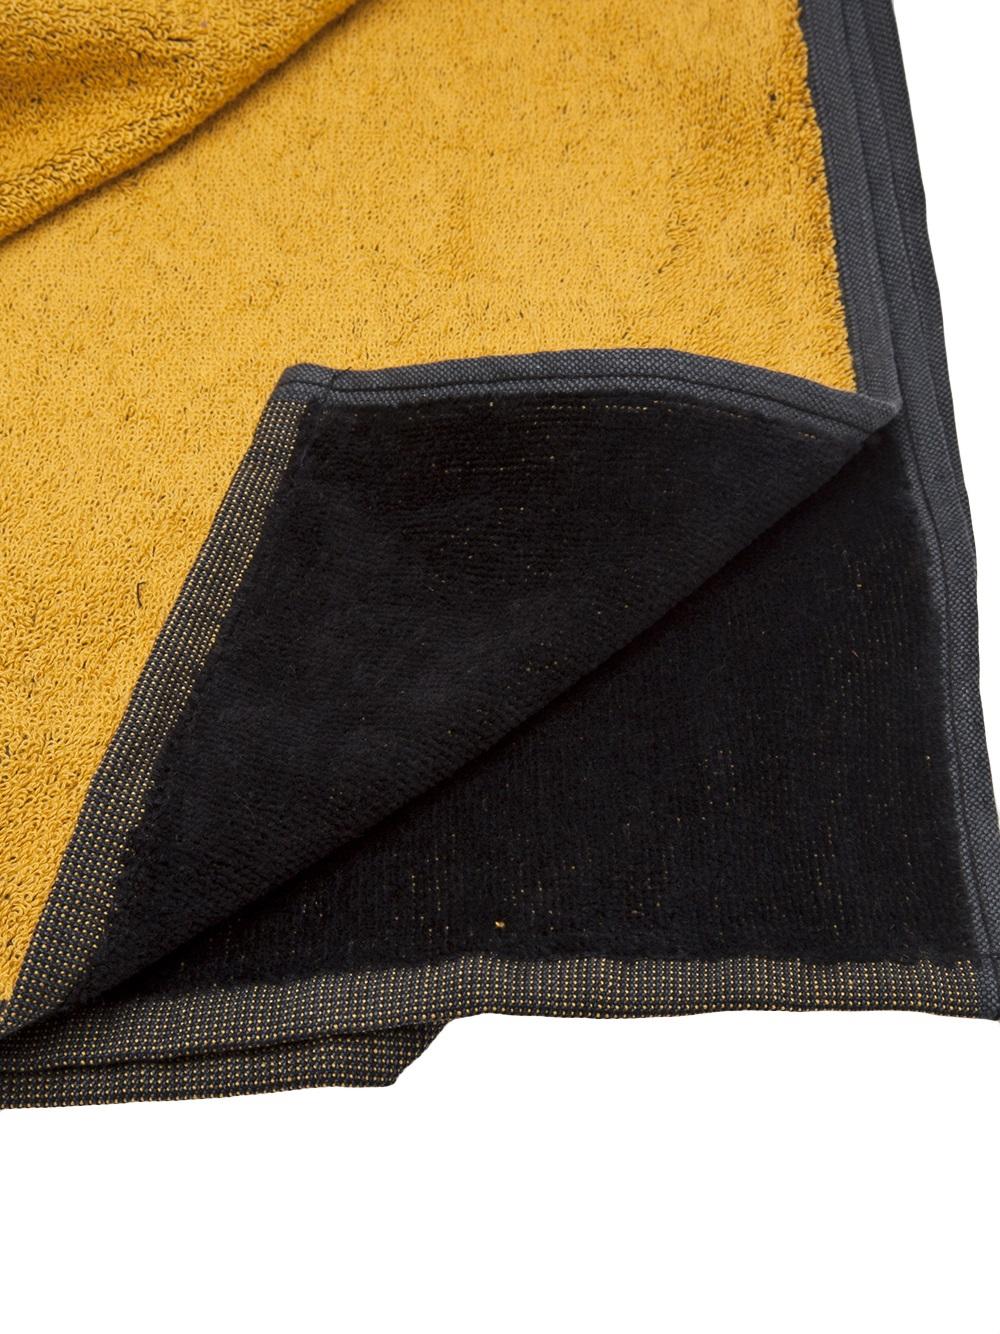 Saks Fifth Avenue Towels Sale Tory Burch Equipment